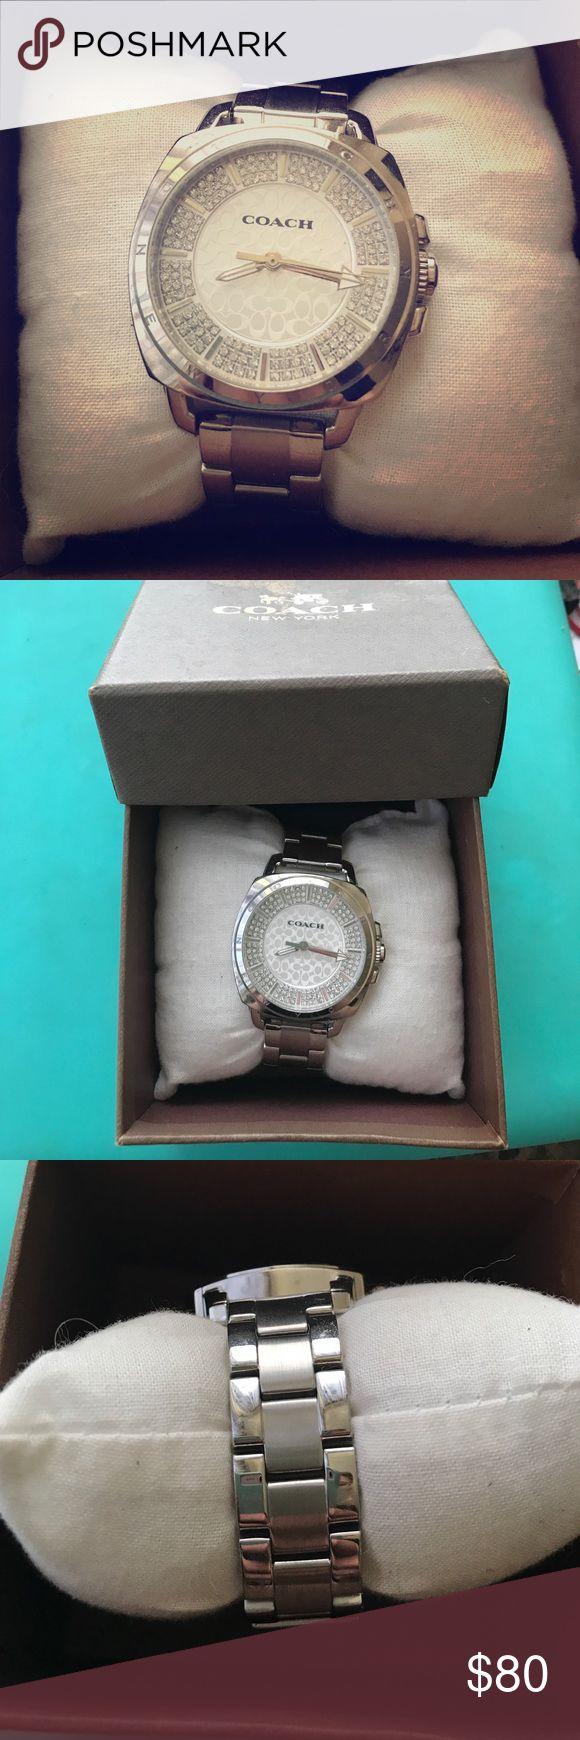 Coach watch, never worn Coach watch in original box. Never worn, perfect condition. Coach Accessories Watches